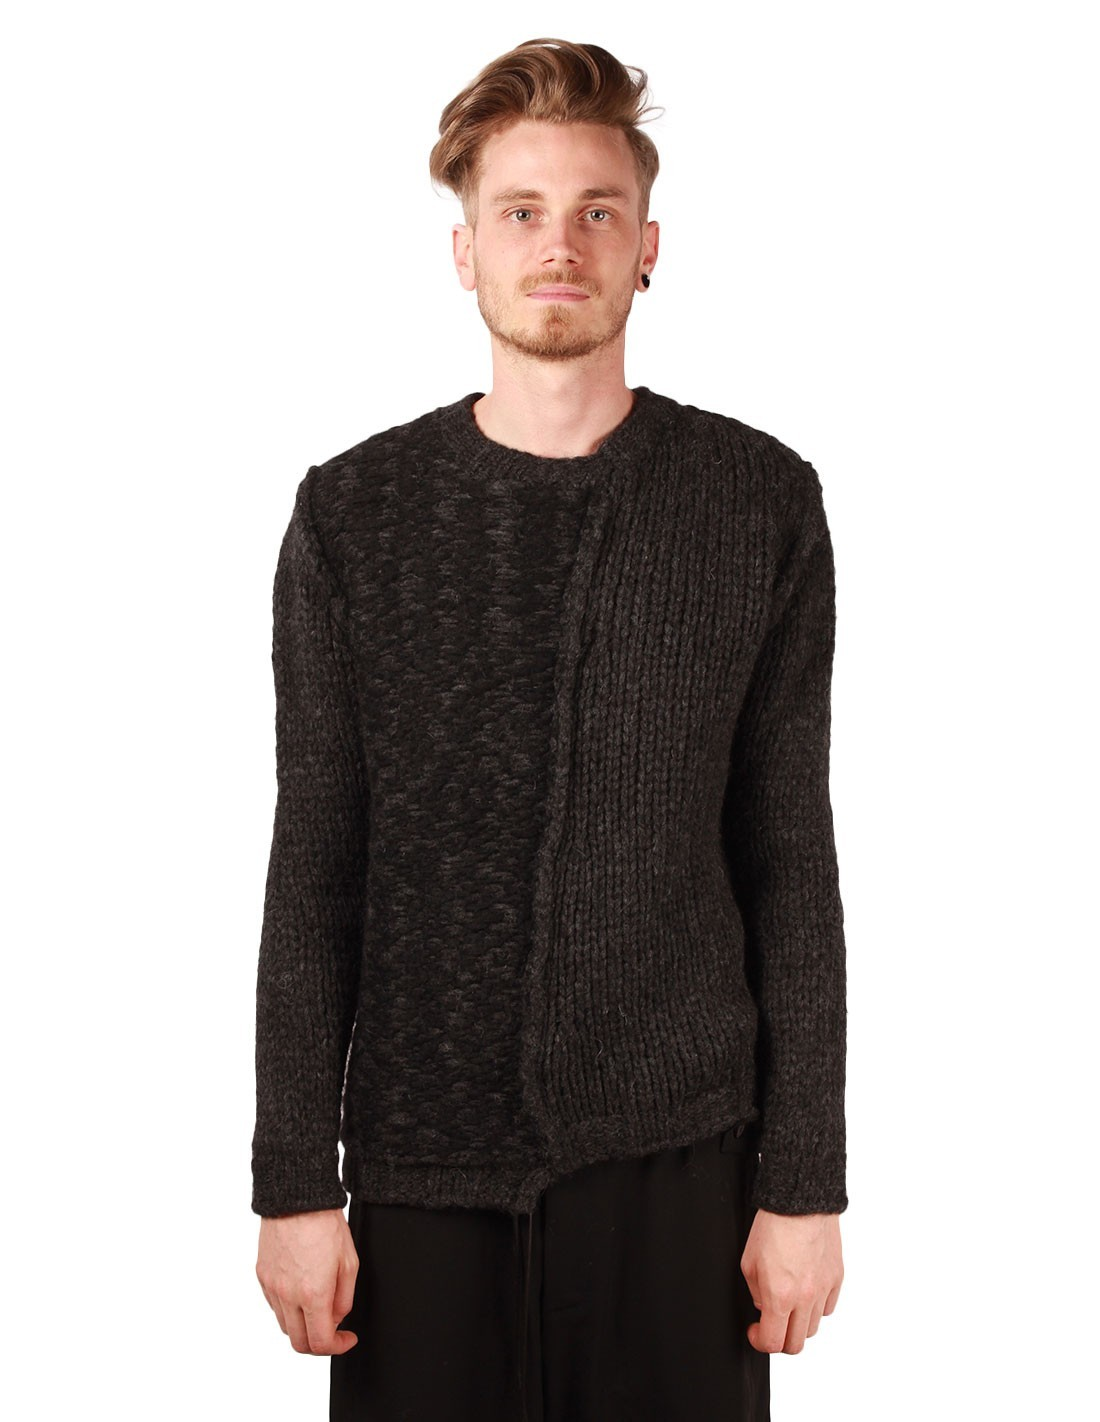 gros pull d 39 hiver gris isabel benenato en laine alpaga et. Black Bedroom Furniture Sets. Home Design Ideas